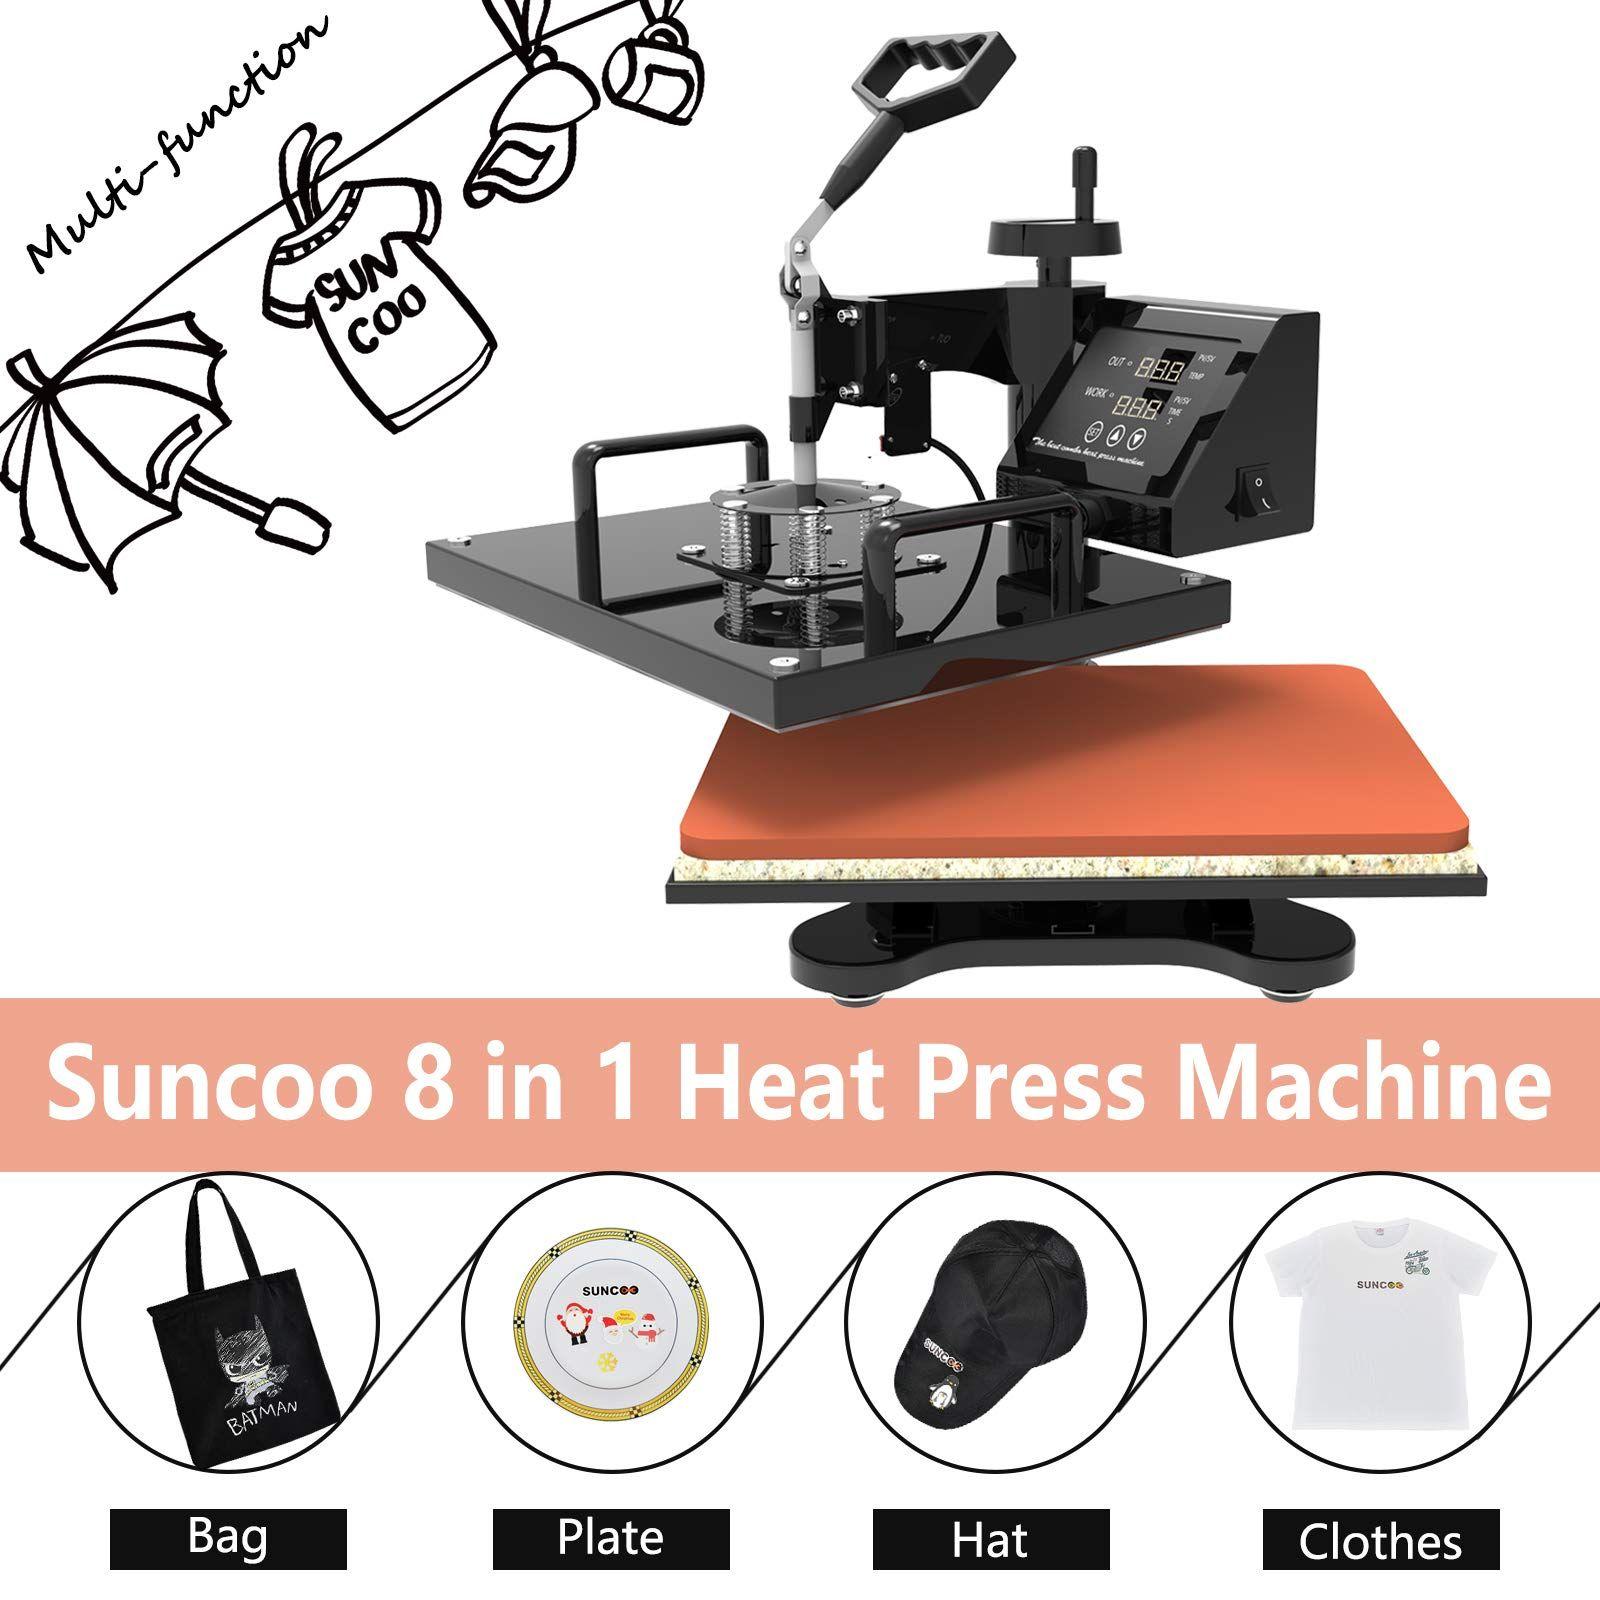 SUNCOO 5 in 1 Heat Press Transfer Machine Hot Pressing Vinyl Digital Sublimation Combo Kit for T-Shirt//Mug//Hat//Cap//Ceramic 360 Degree Swing Away 12x15